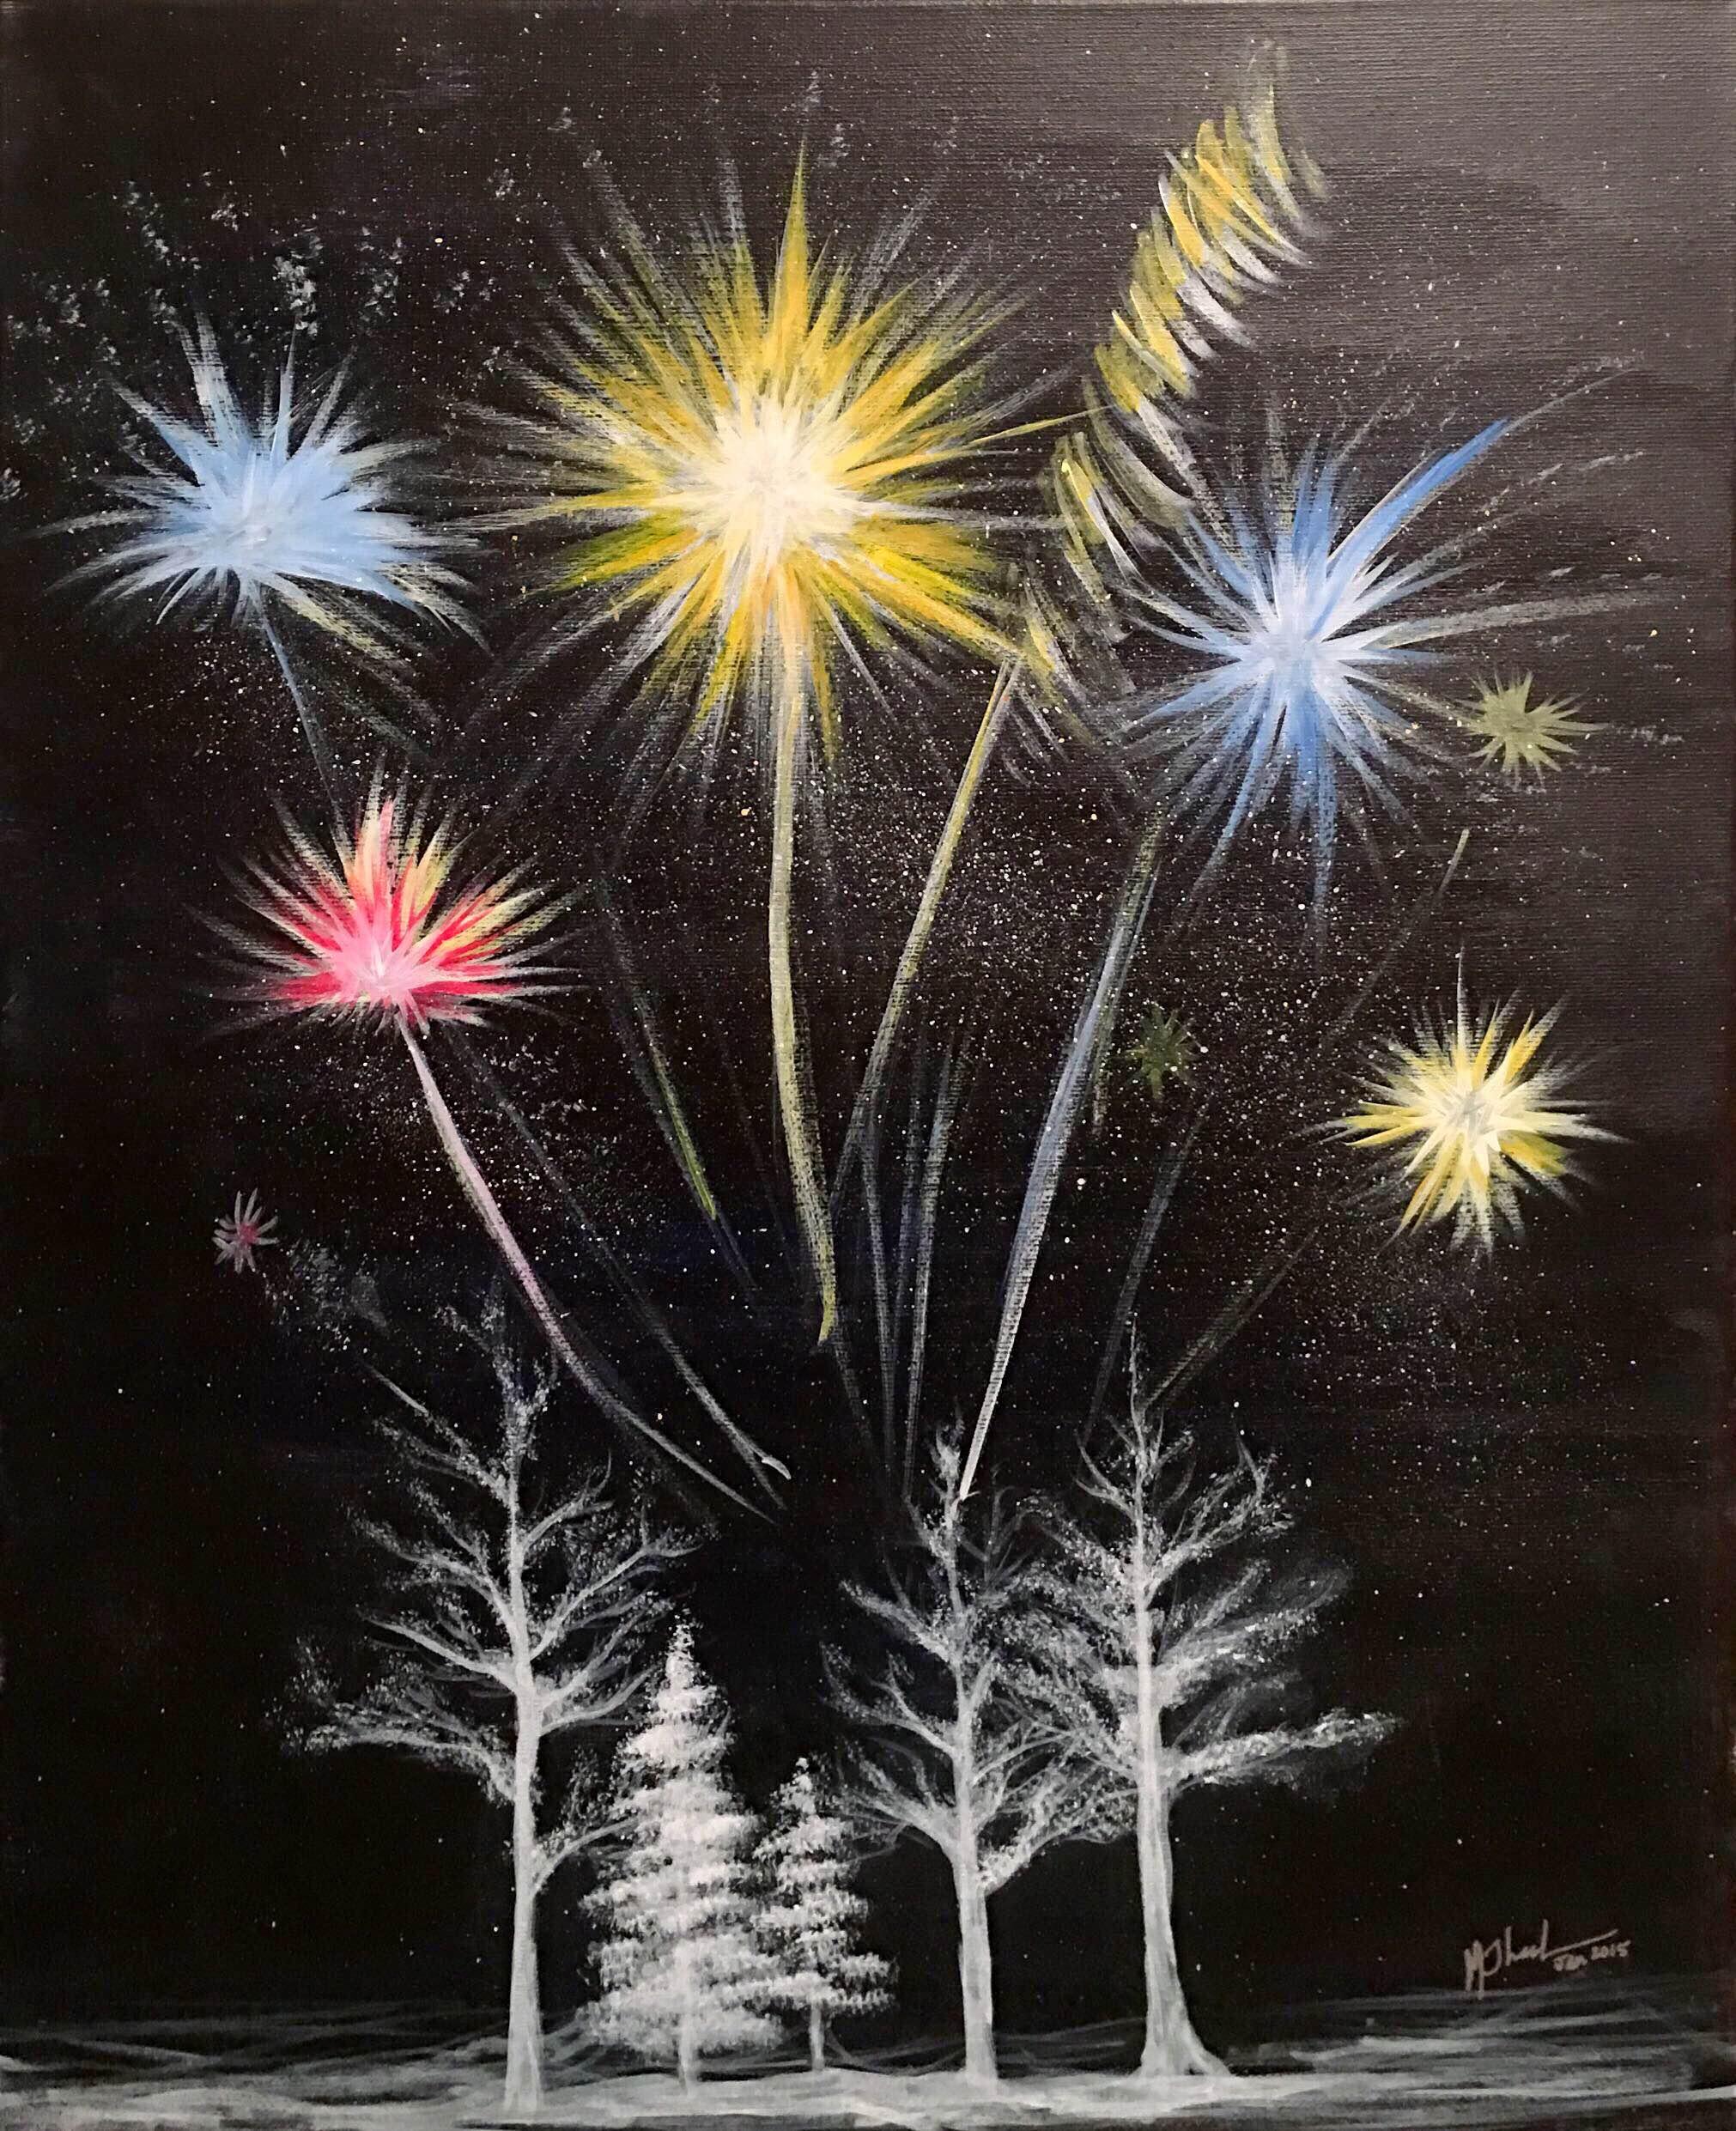 Glowing Fireworks